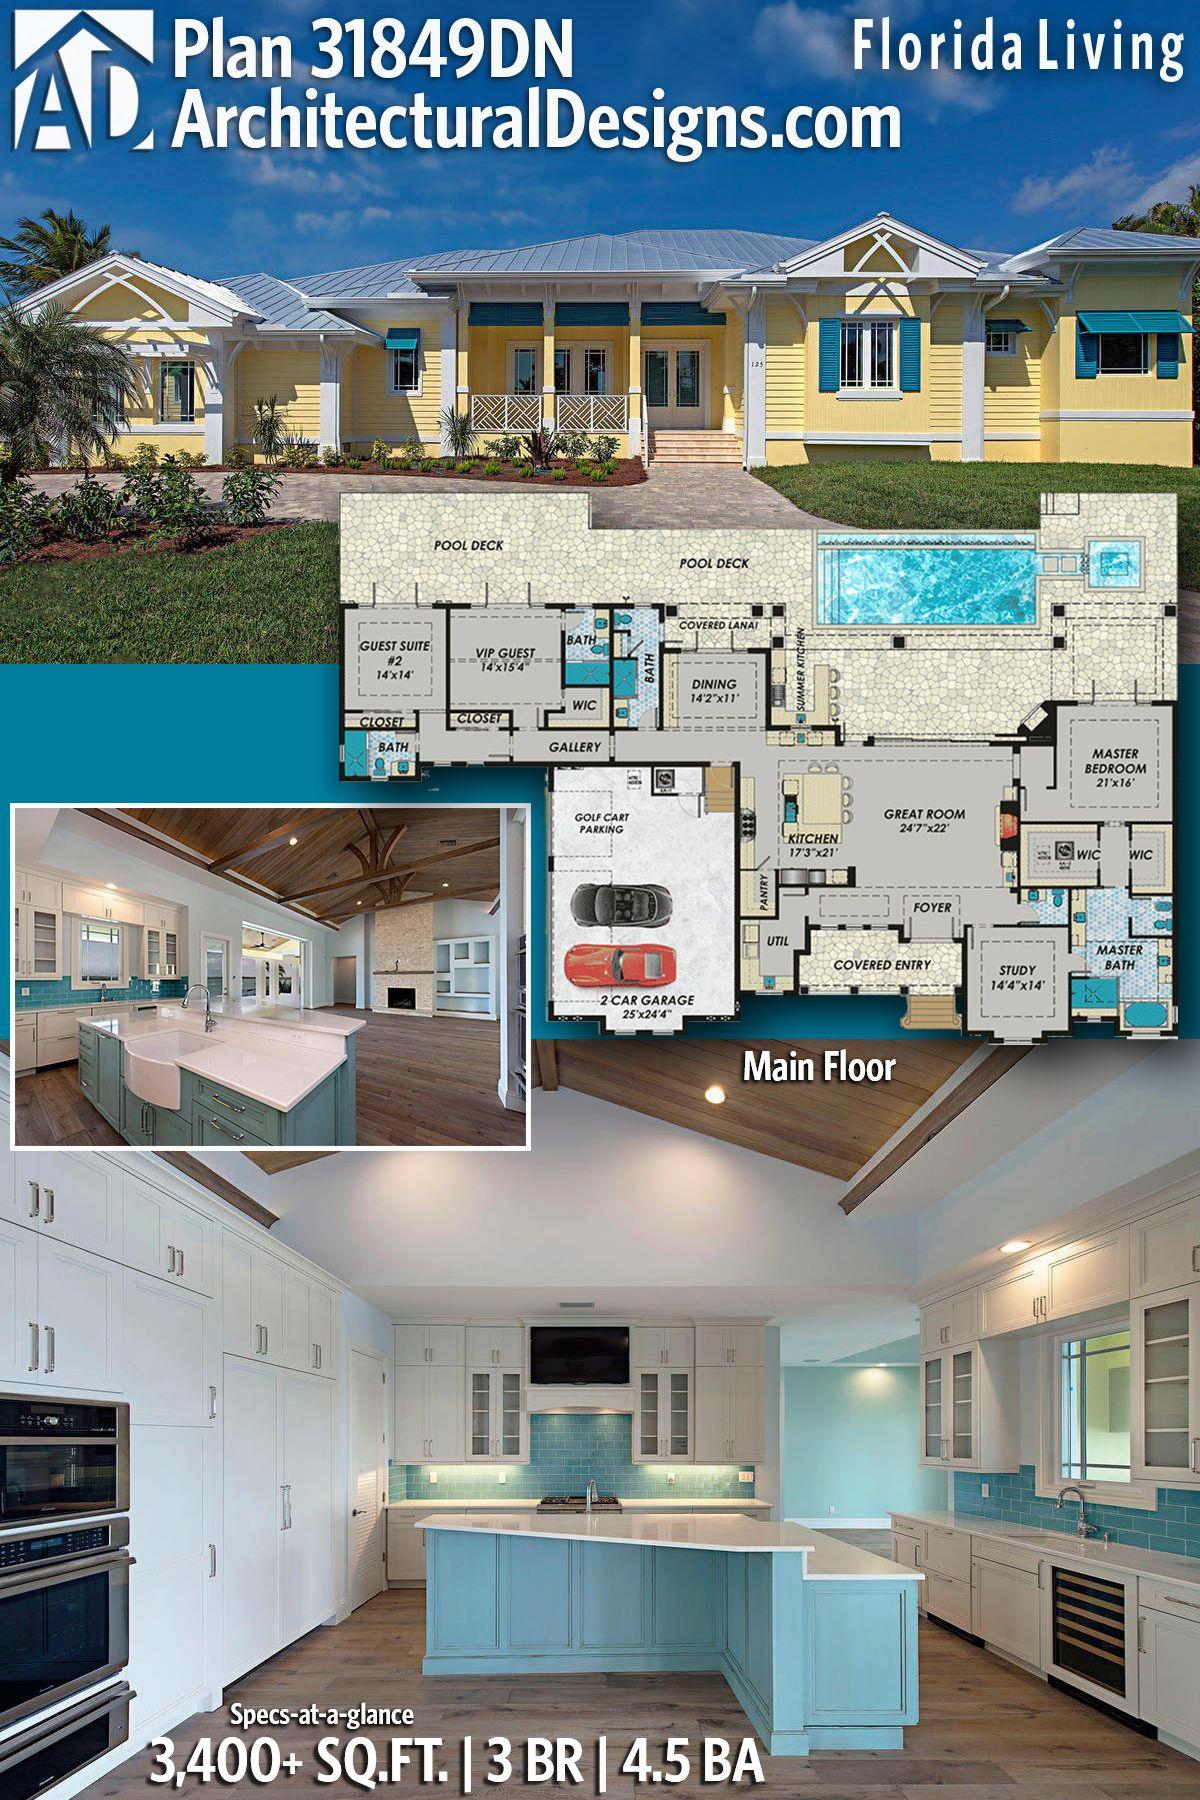 plan 31849dn florida living in 2018 architectural designs rh pinterest com